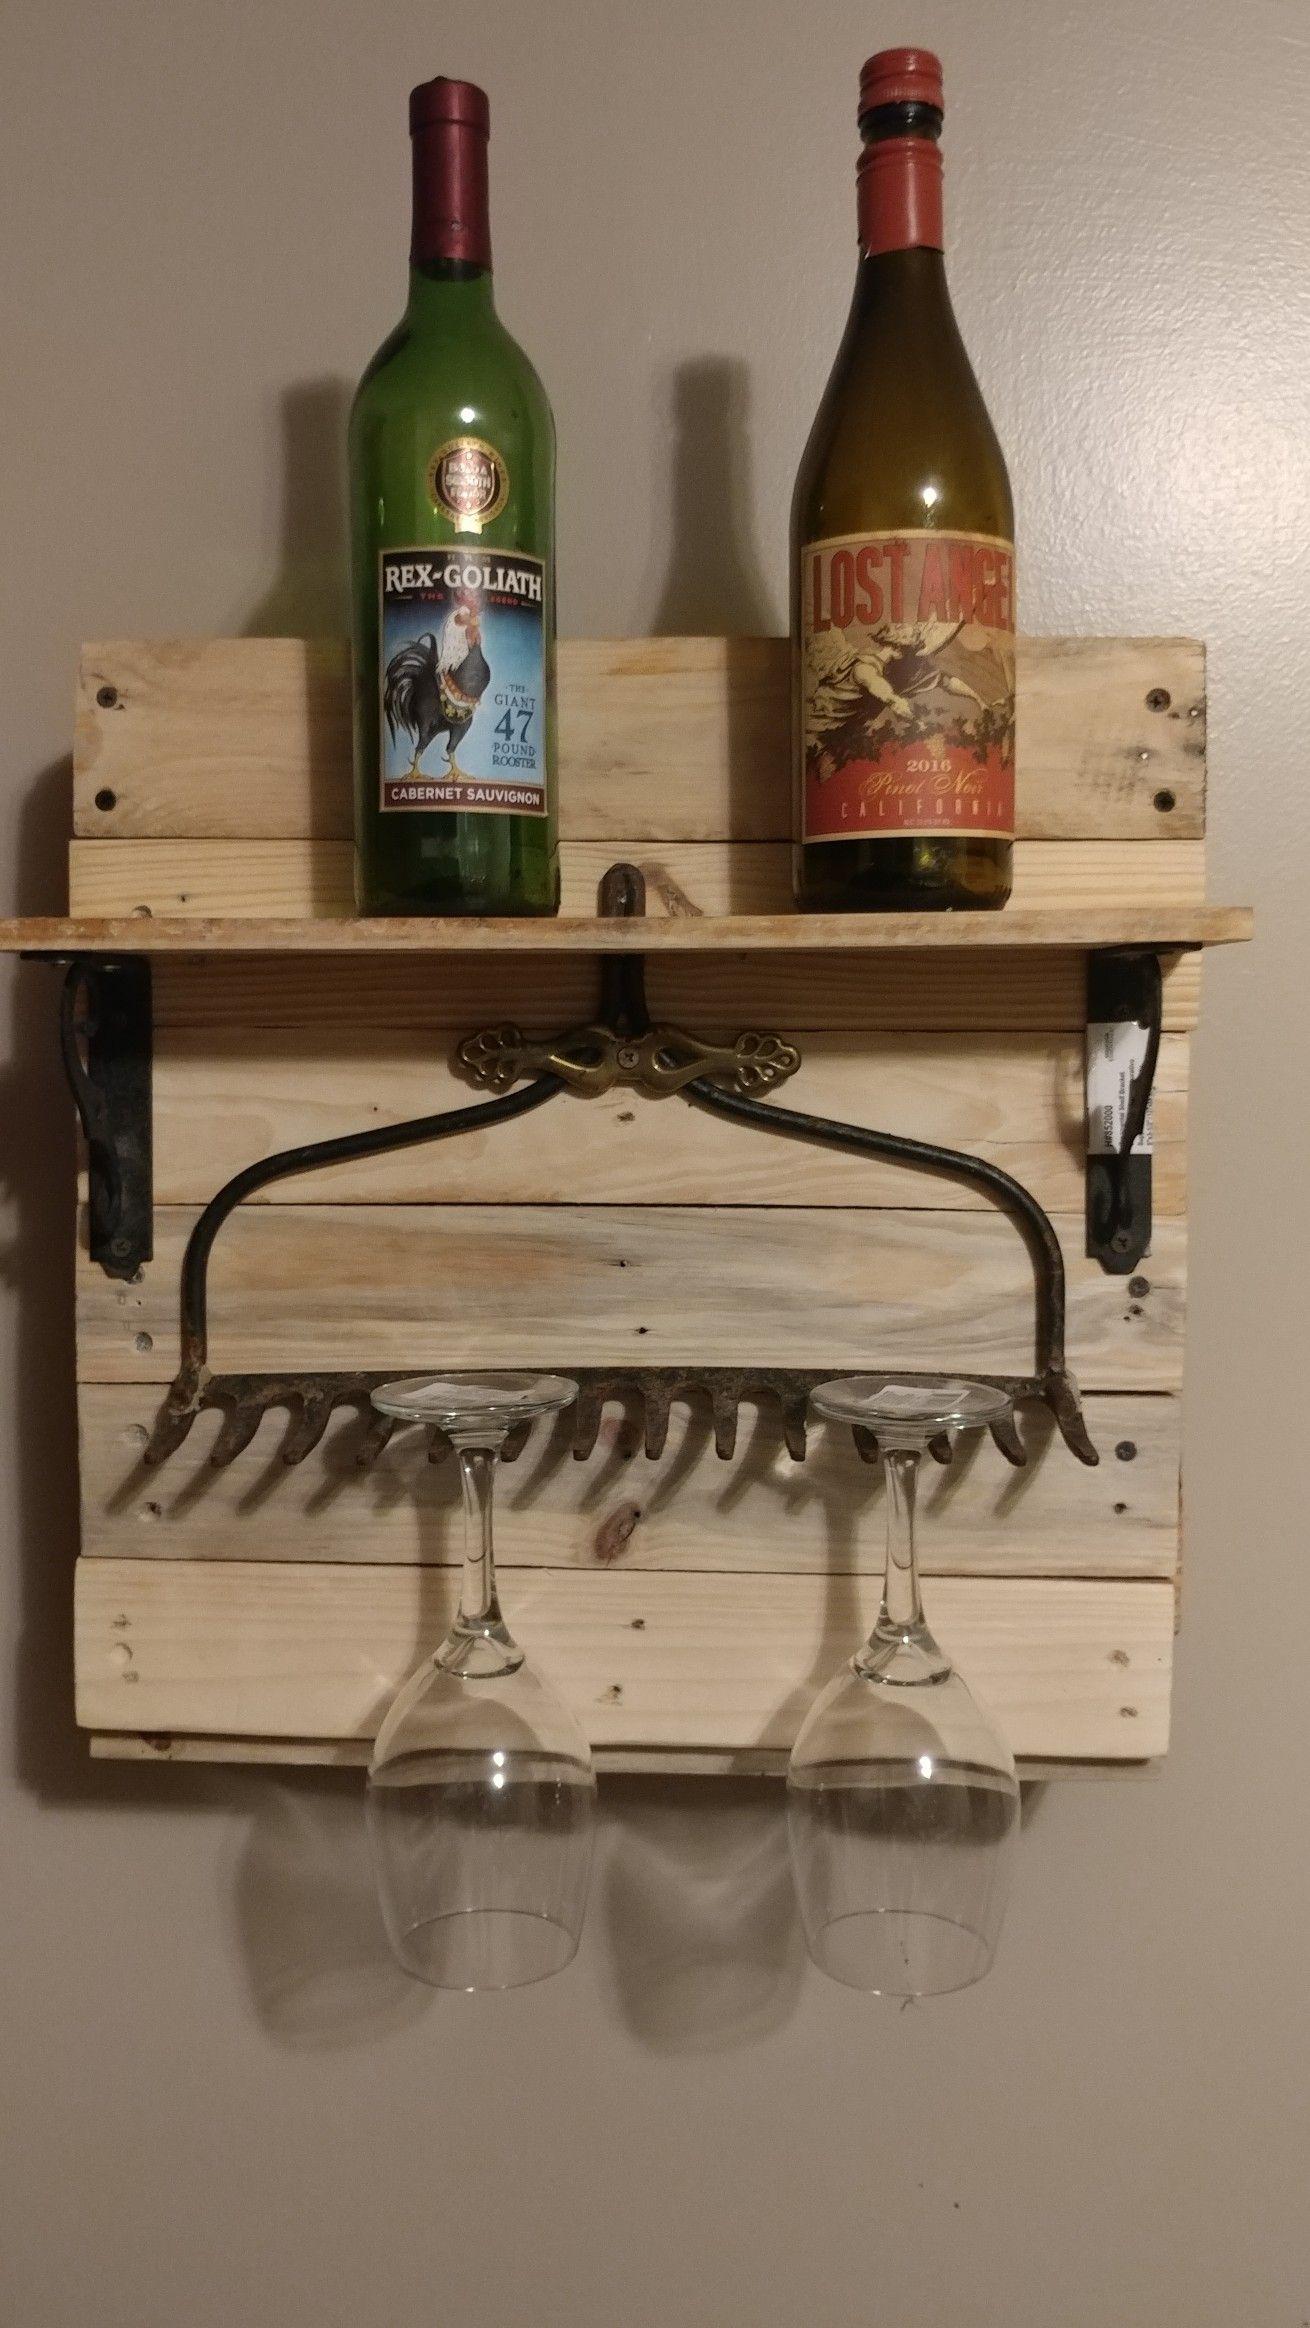 Pallet Wine Rack With A Heavy Rake Wine Glass Holder Pallet Wine Rack Wine Rack Glass Holder Wine Glass Holder Diy Wine rack with glass holder